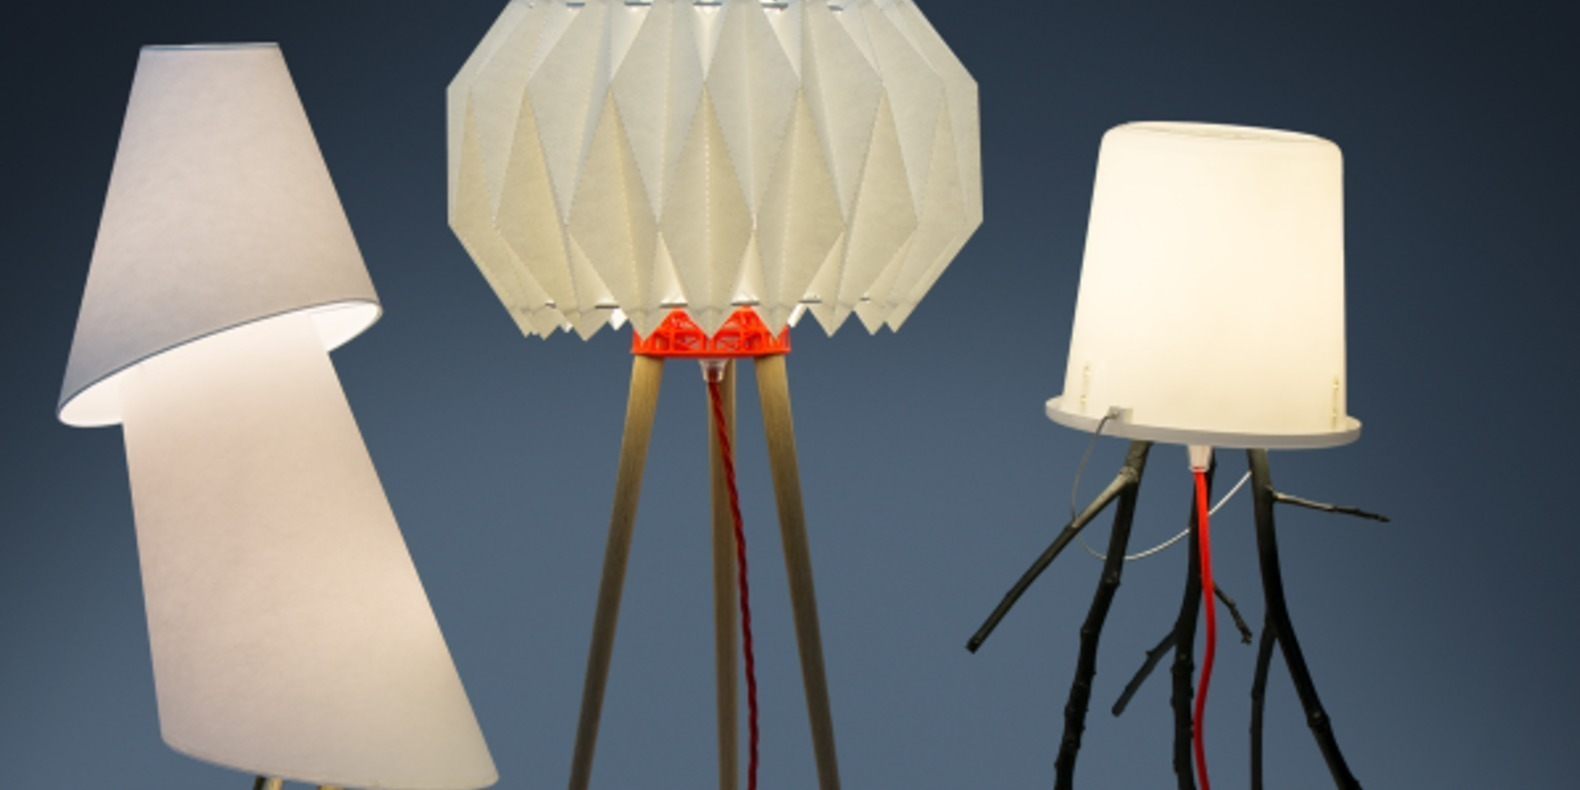 besenthal_05 besenthal_04 MYO lampe imprimée en 3D lamp 3D printing impression 3D